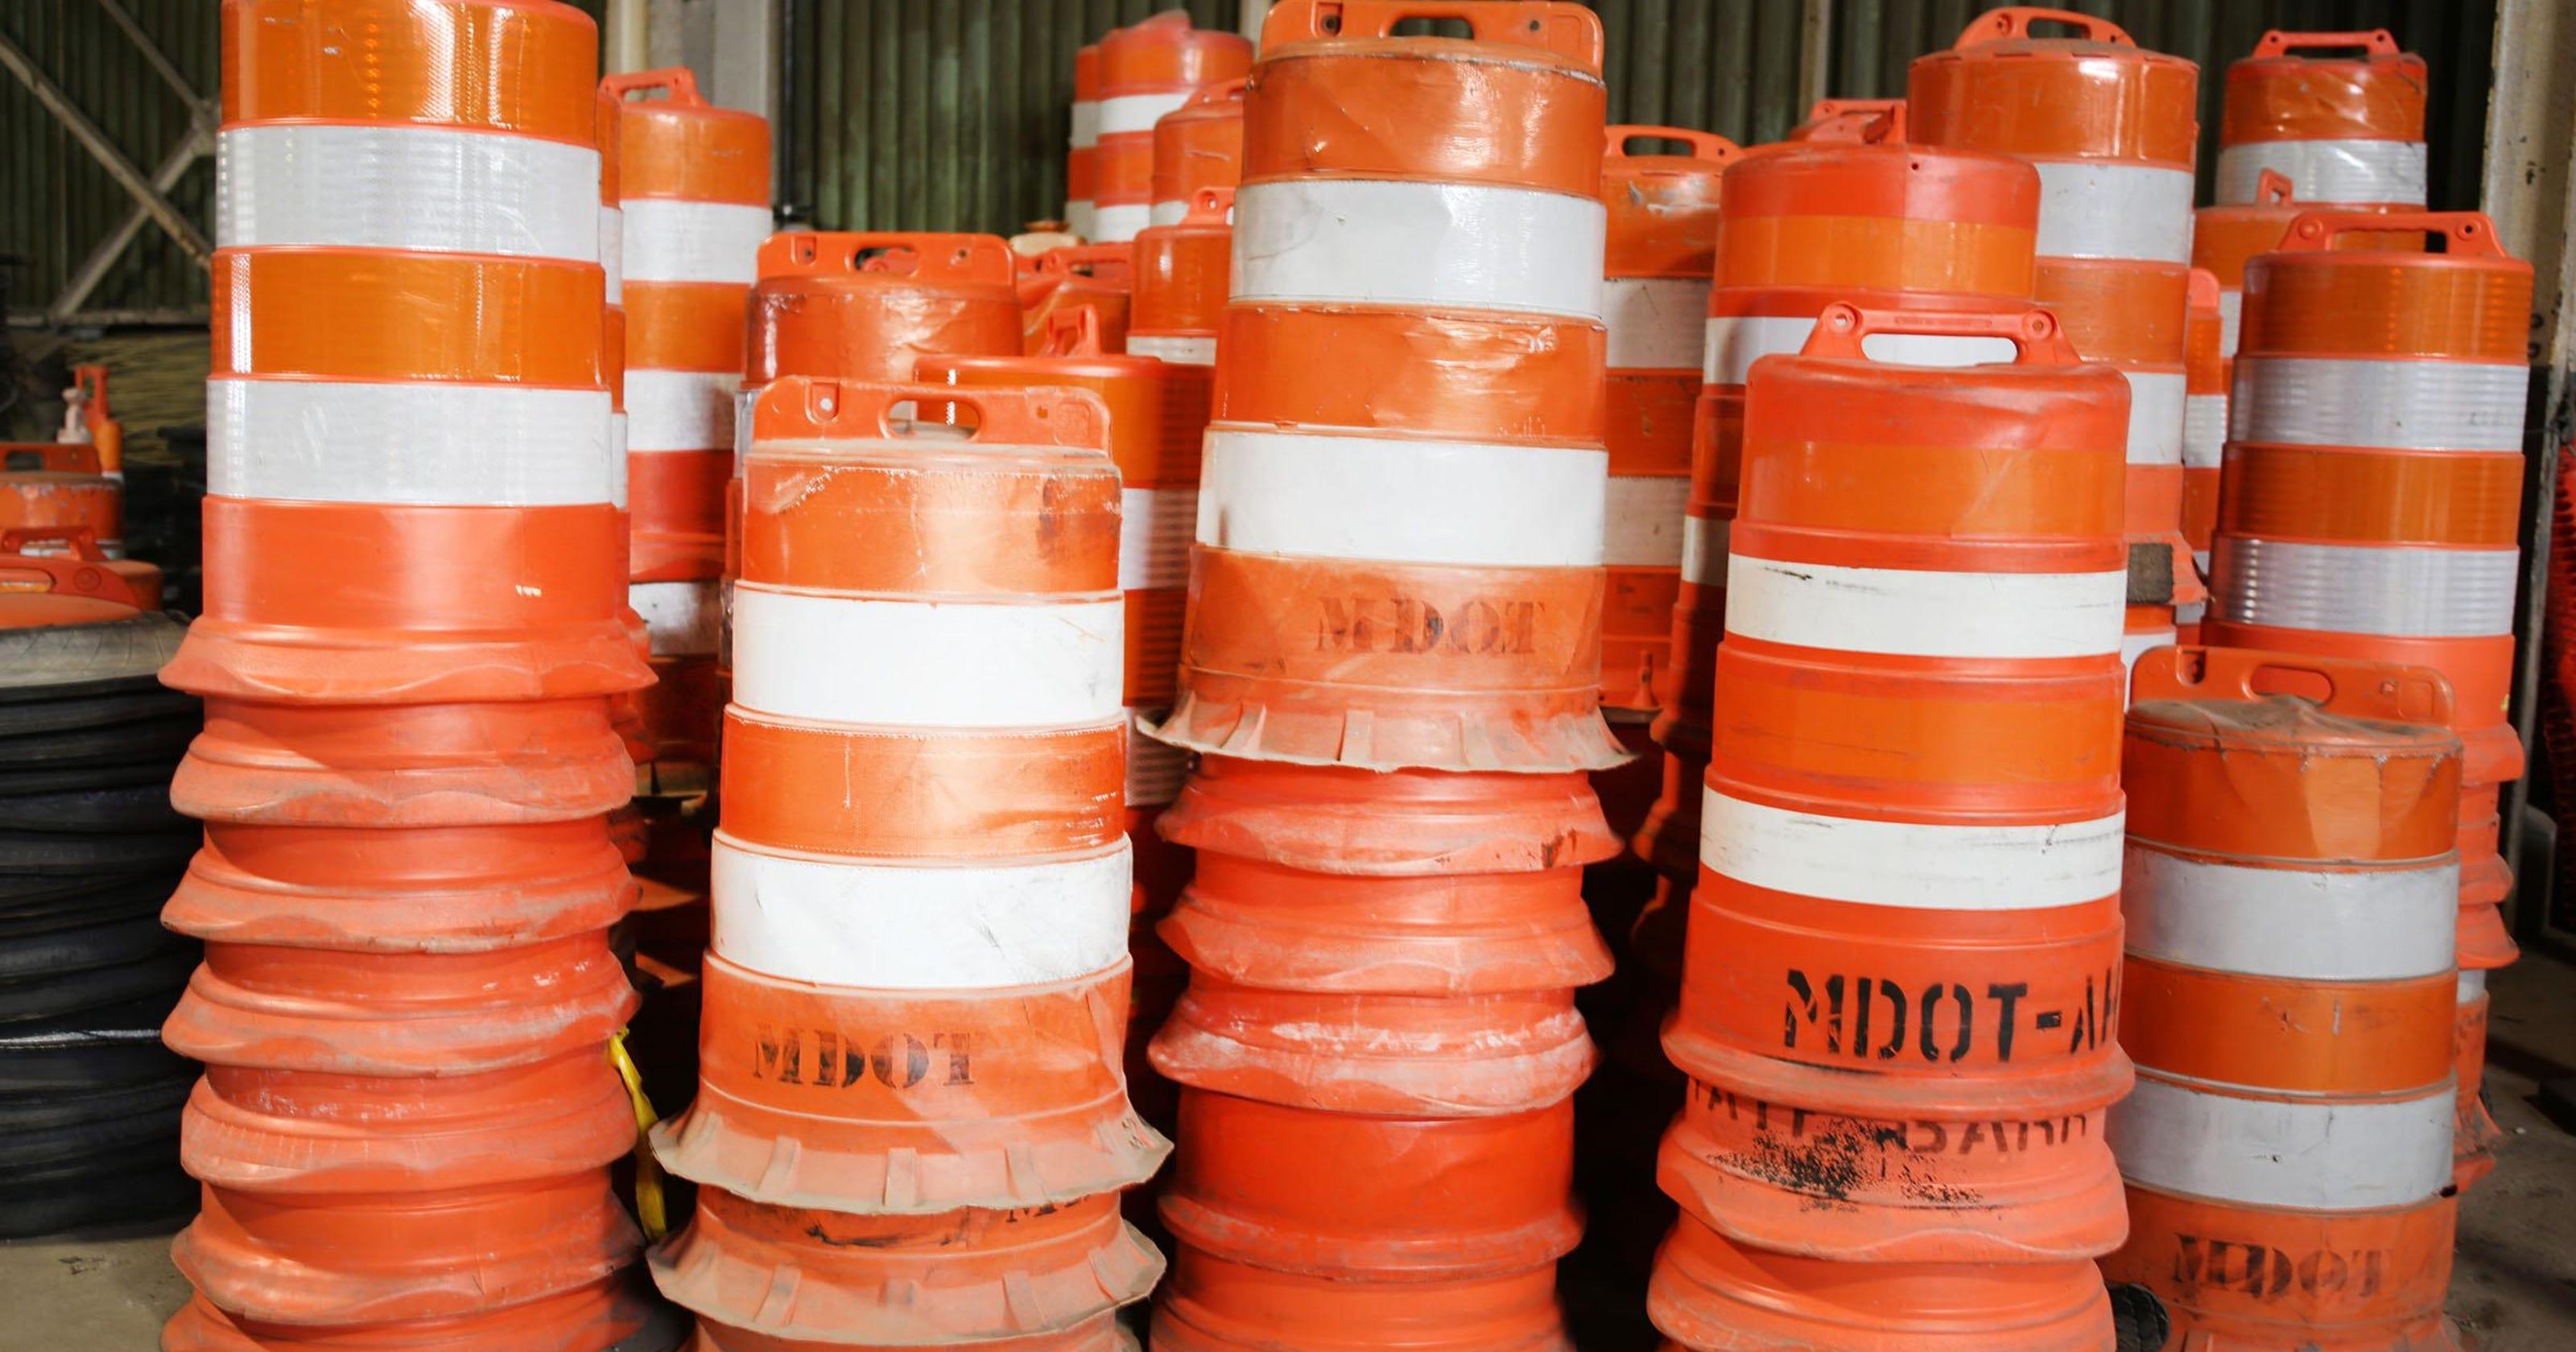 State eyes double-digit jump in price of orange barrels